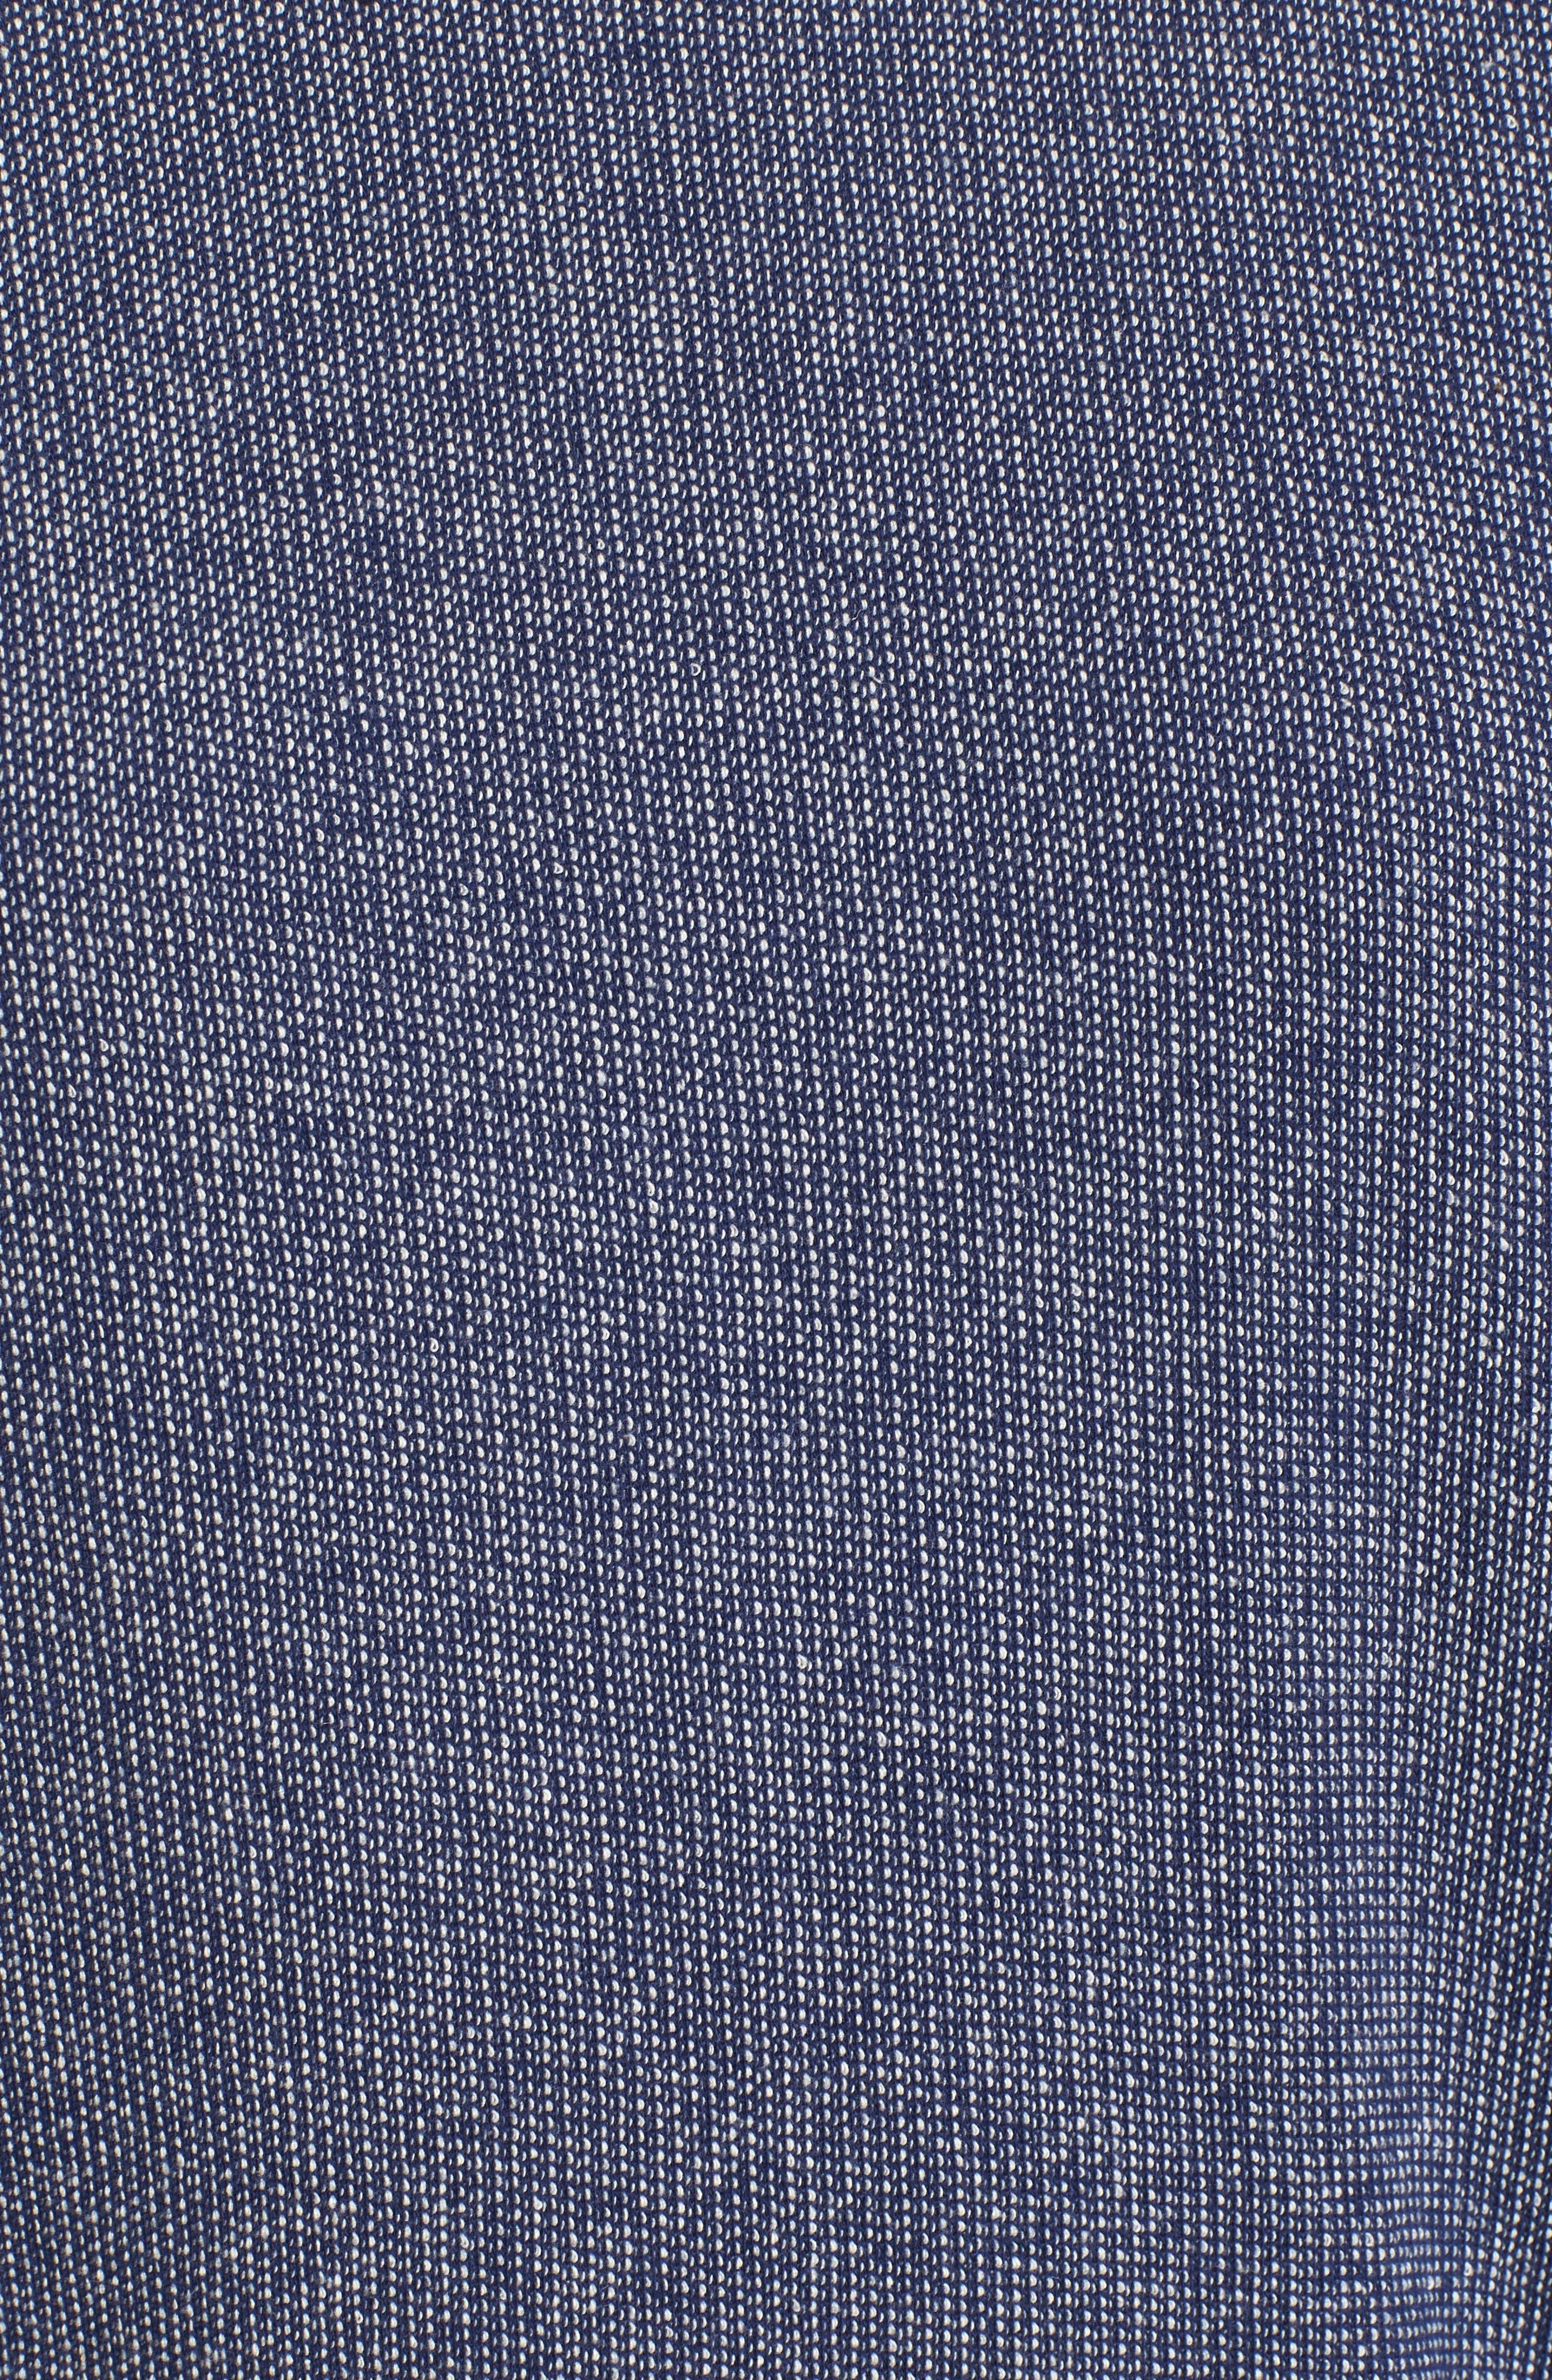 Sweatshirt Dress,                             Alternate thumbnail 6, color,                             476